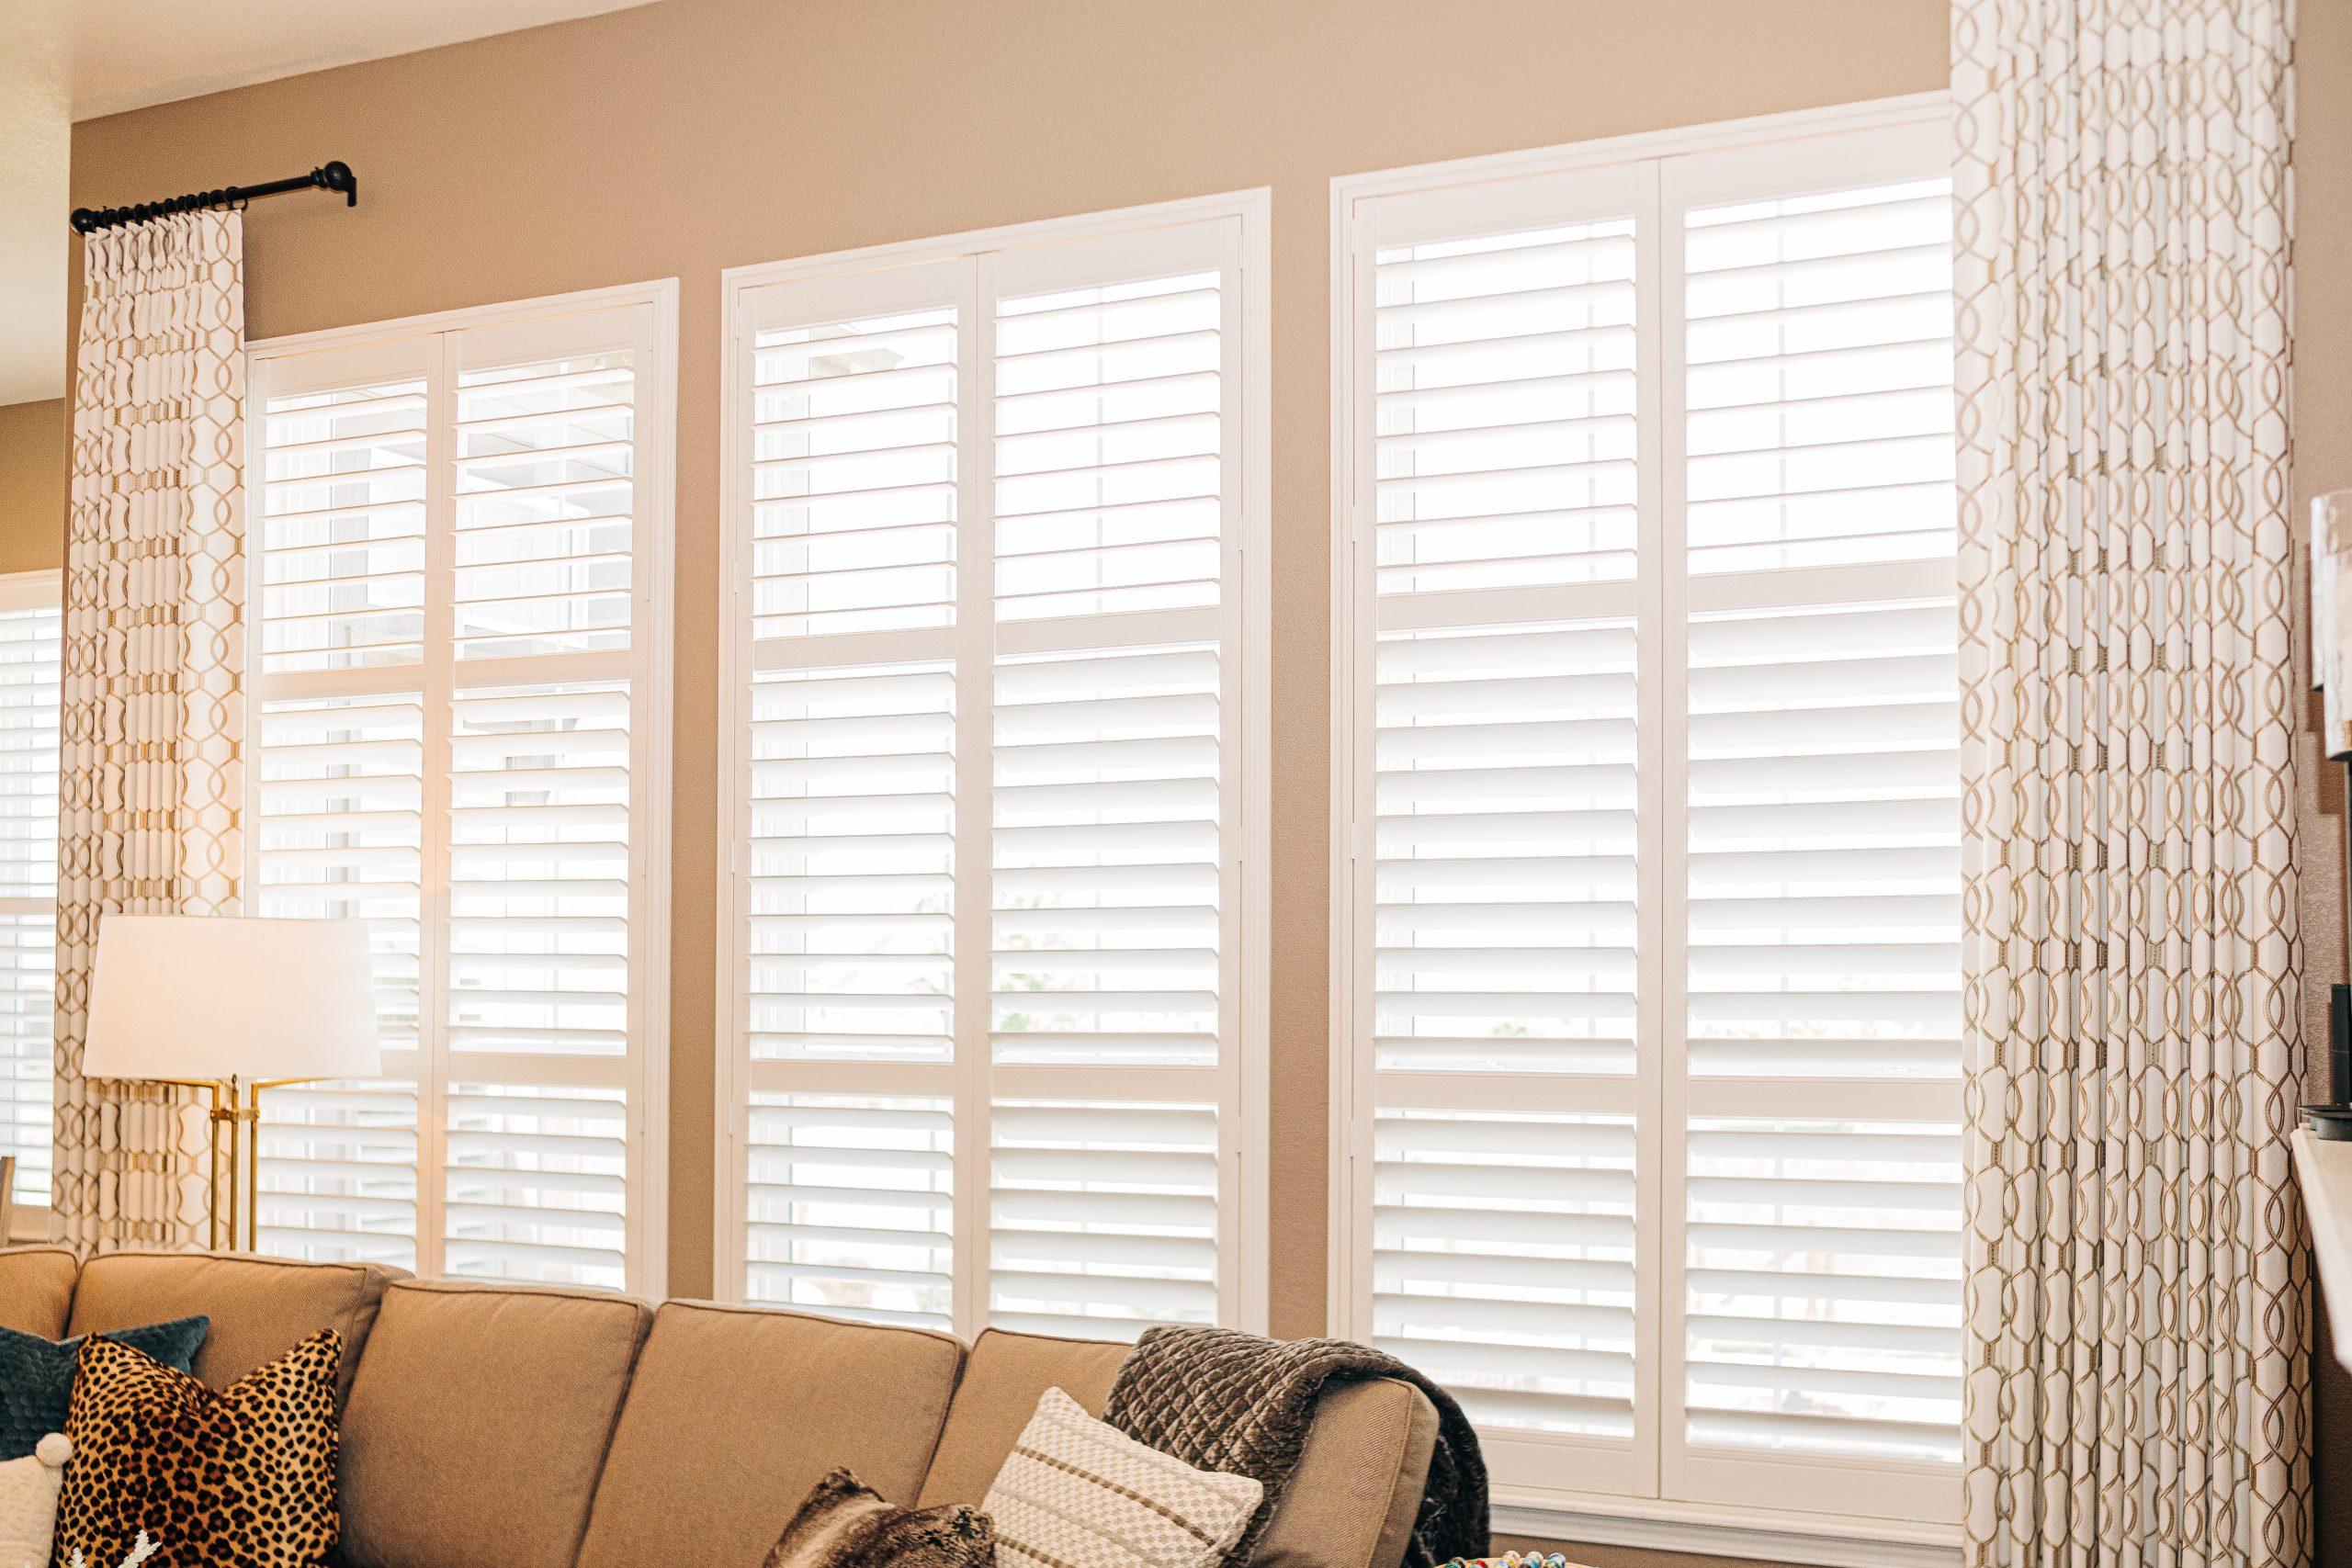 Drape Haus window treatment